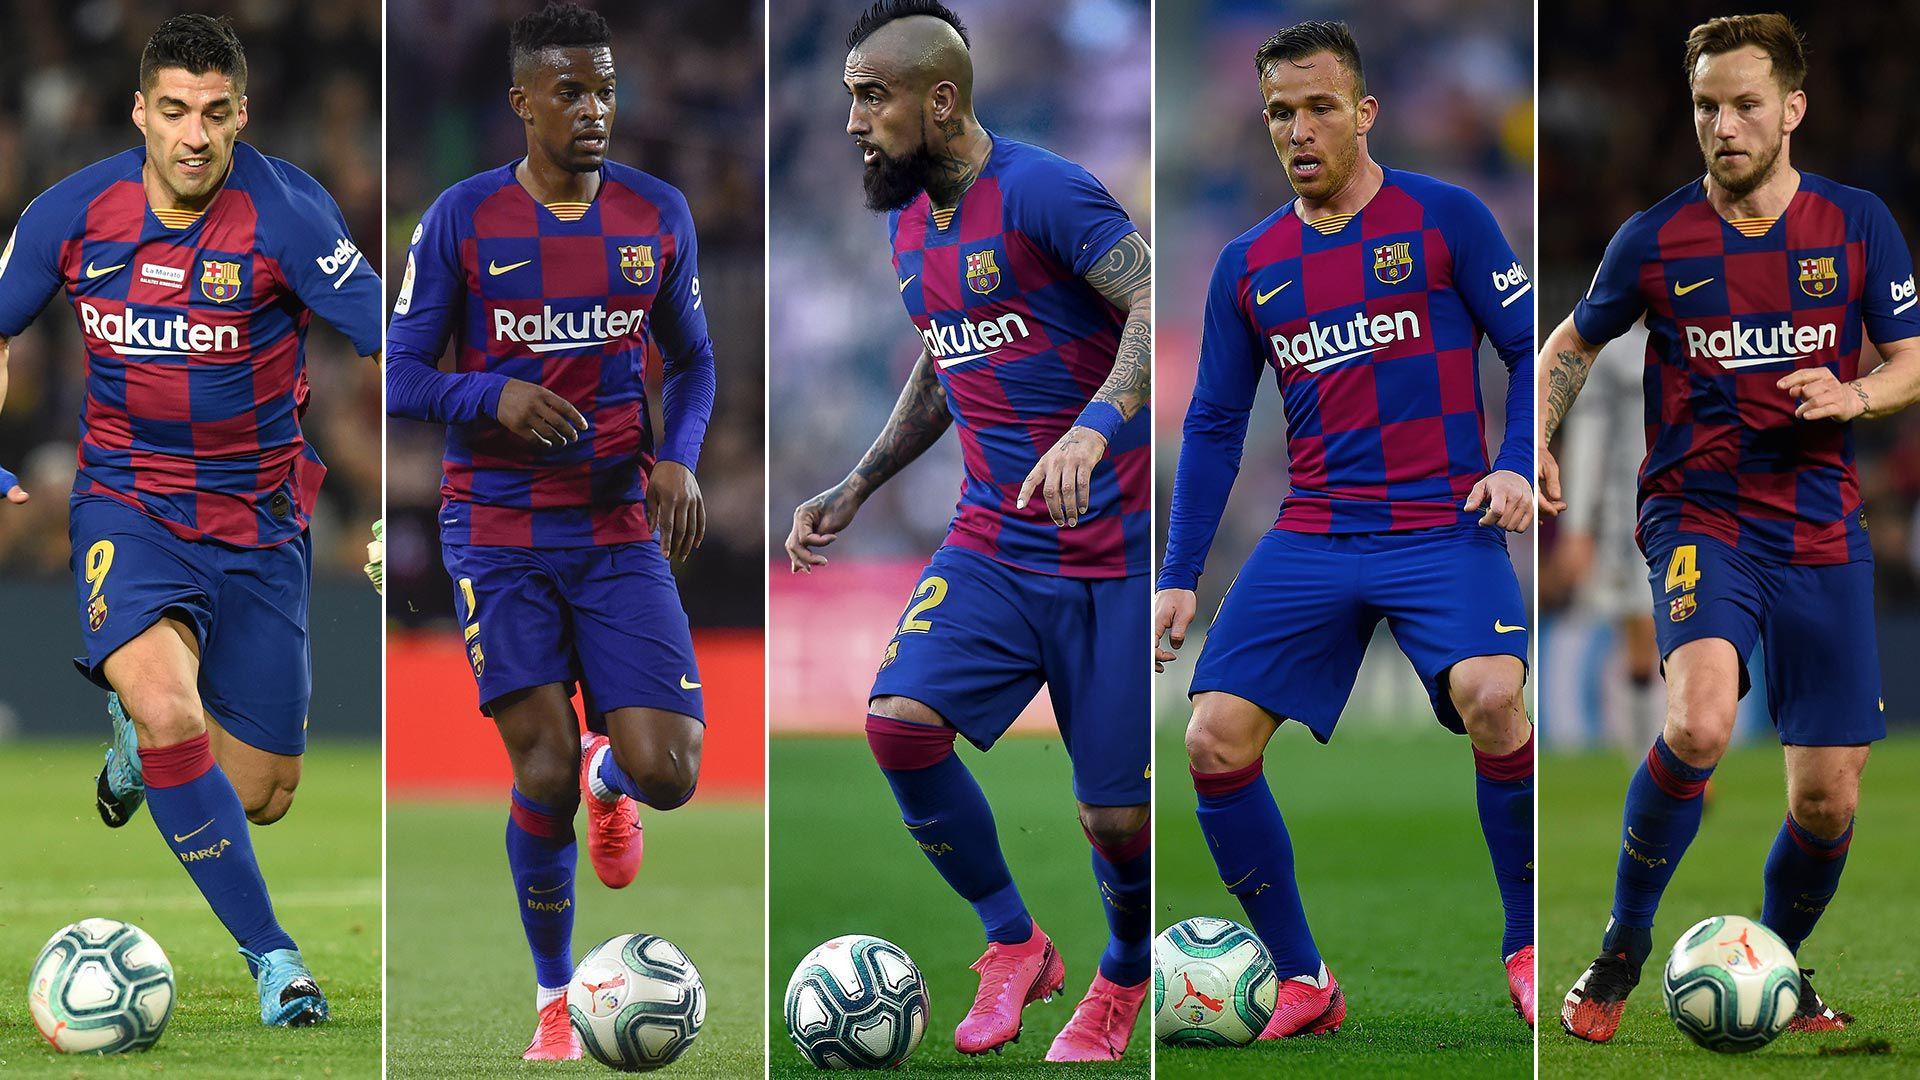 Barcelona 1920 Suárez, Semedo, Vidal, Arthur, Rakitic